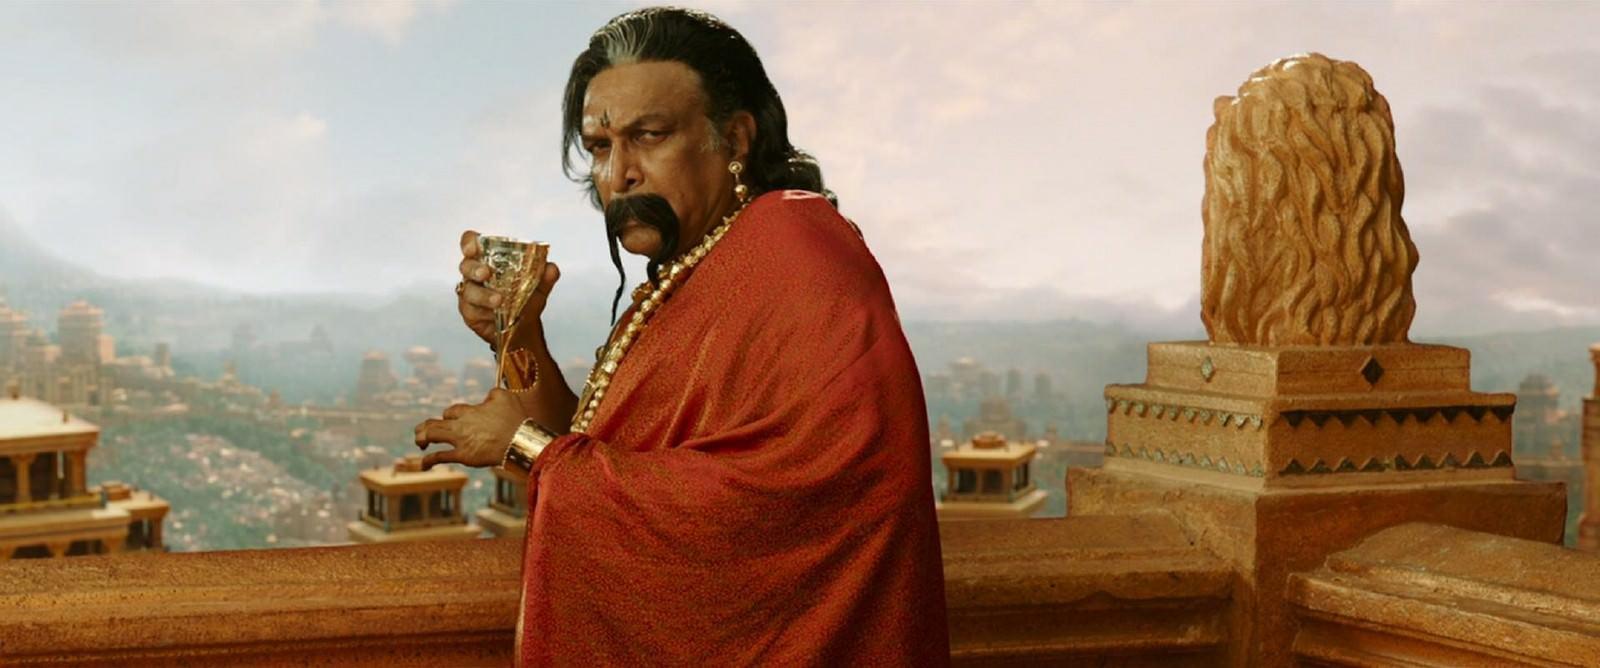 Movie, Baahubali 2: The Conclusion(印度, 2017年) / 巴霍巴利王:磅礡終章(台灣) / 巴霍巴利王(下):终结(網路), 電影角色與演員介紹